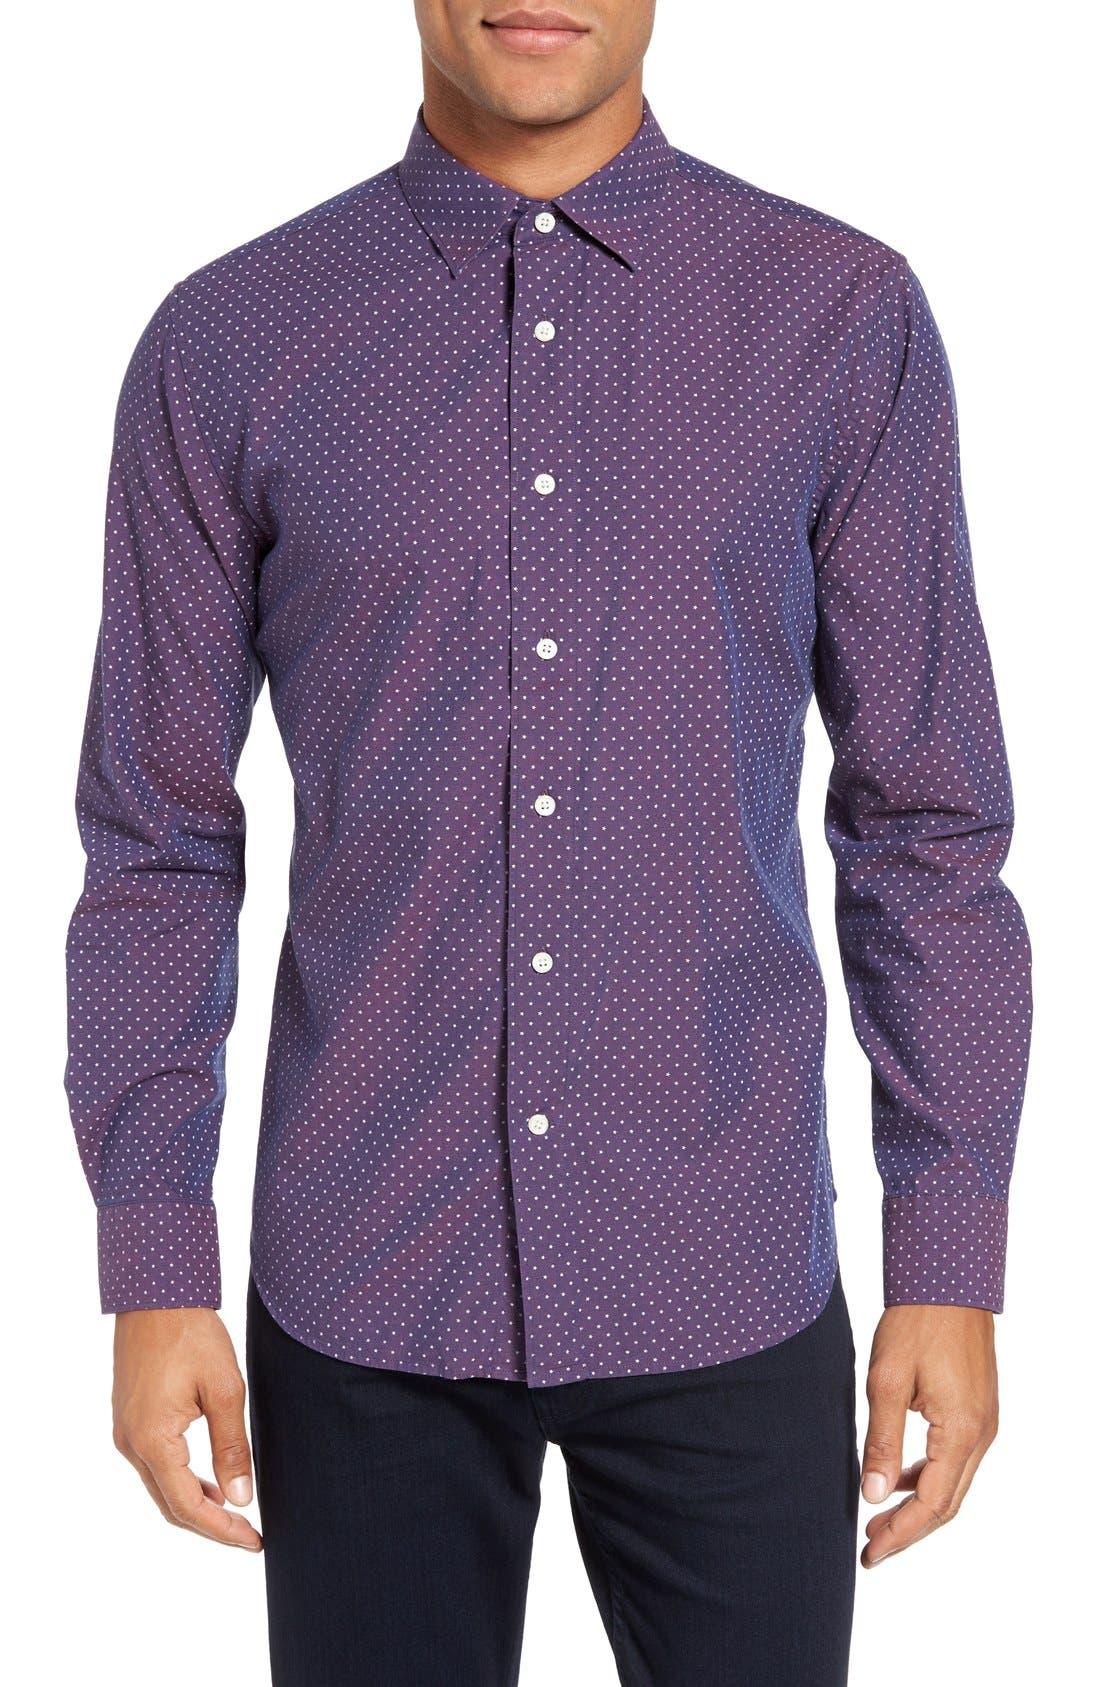 Alternate Image 1 Selected - Slate & Stone Slim Fit Star Print Sport Shirt